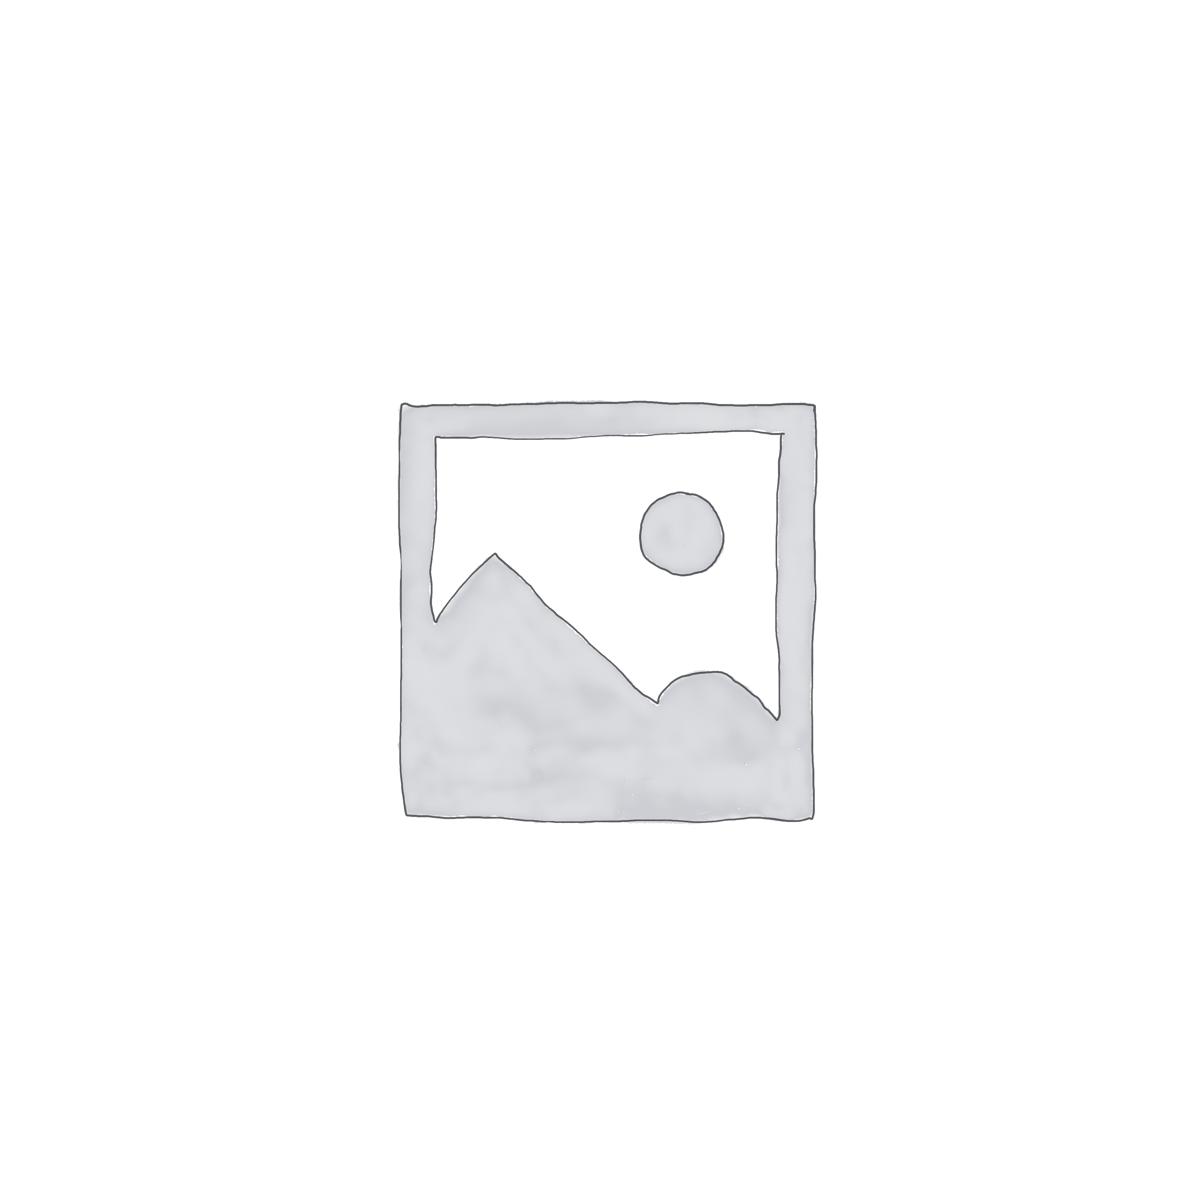 Black White Geometric Shapes Wallpaper Mural